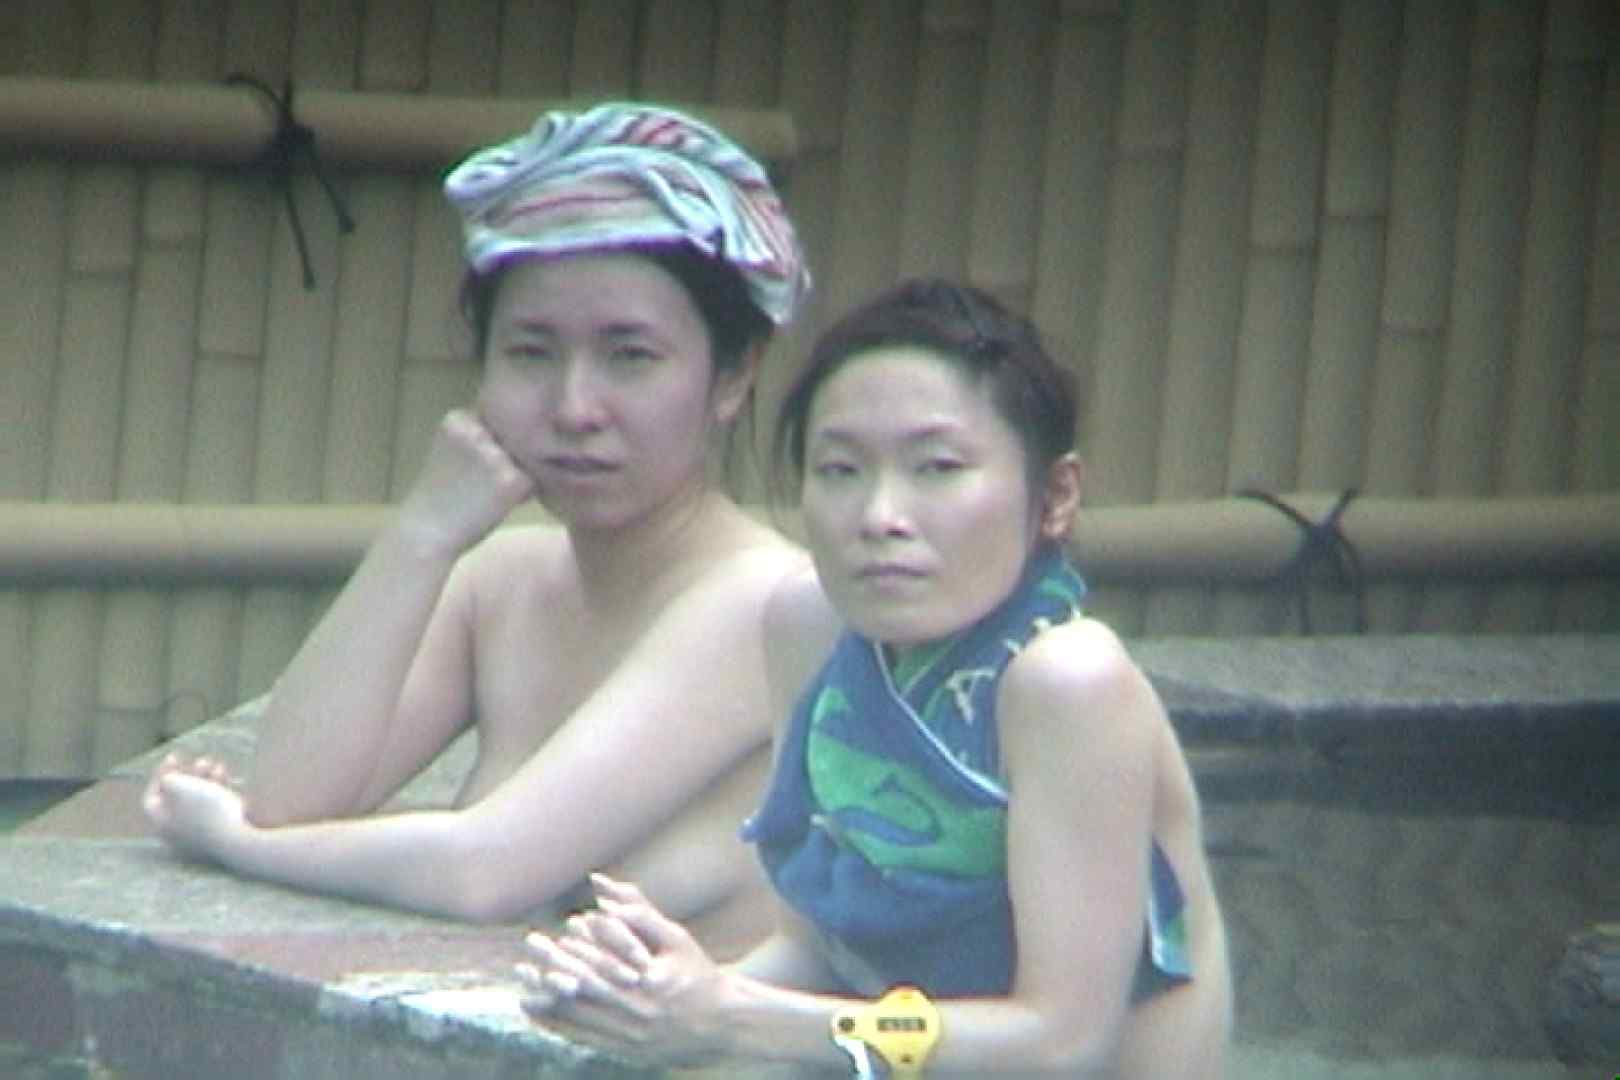 Aquaな露天風呂Vol.106 盗撮シリーズ | 露天風呂編  86PIX 25